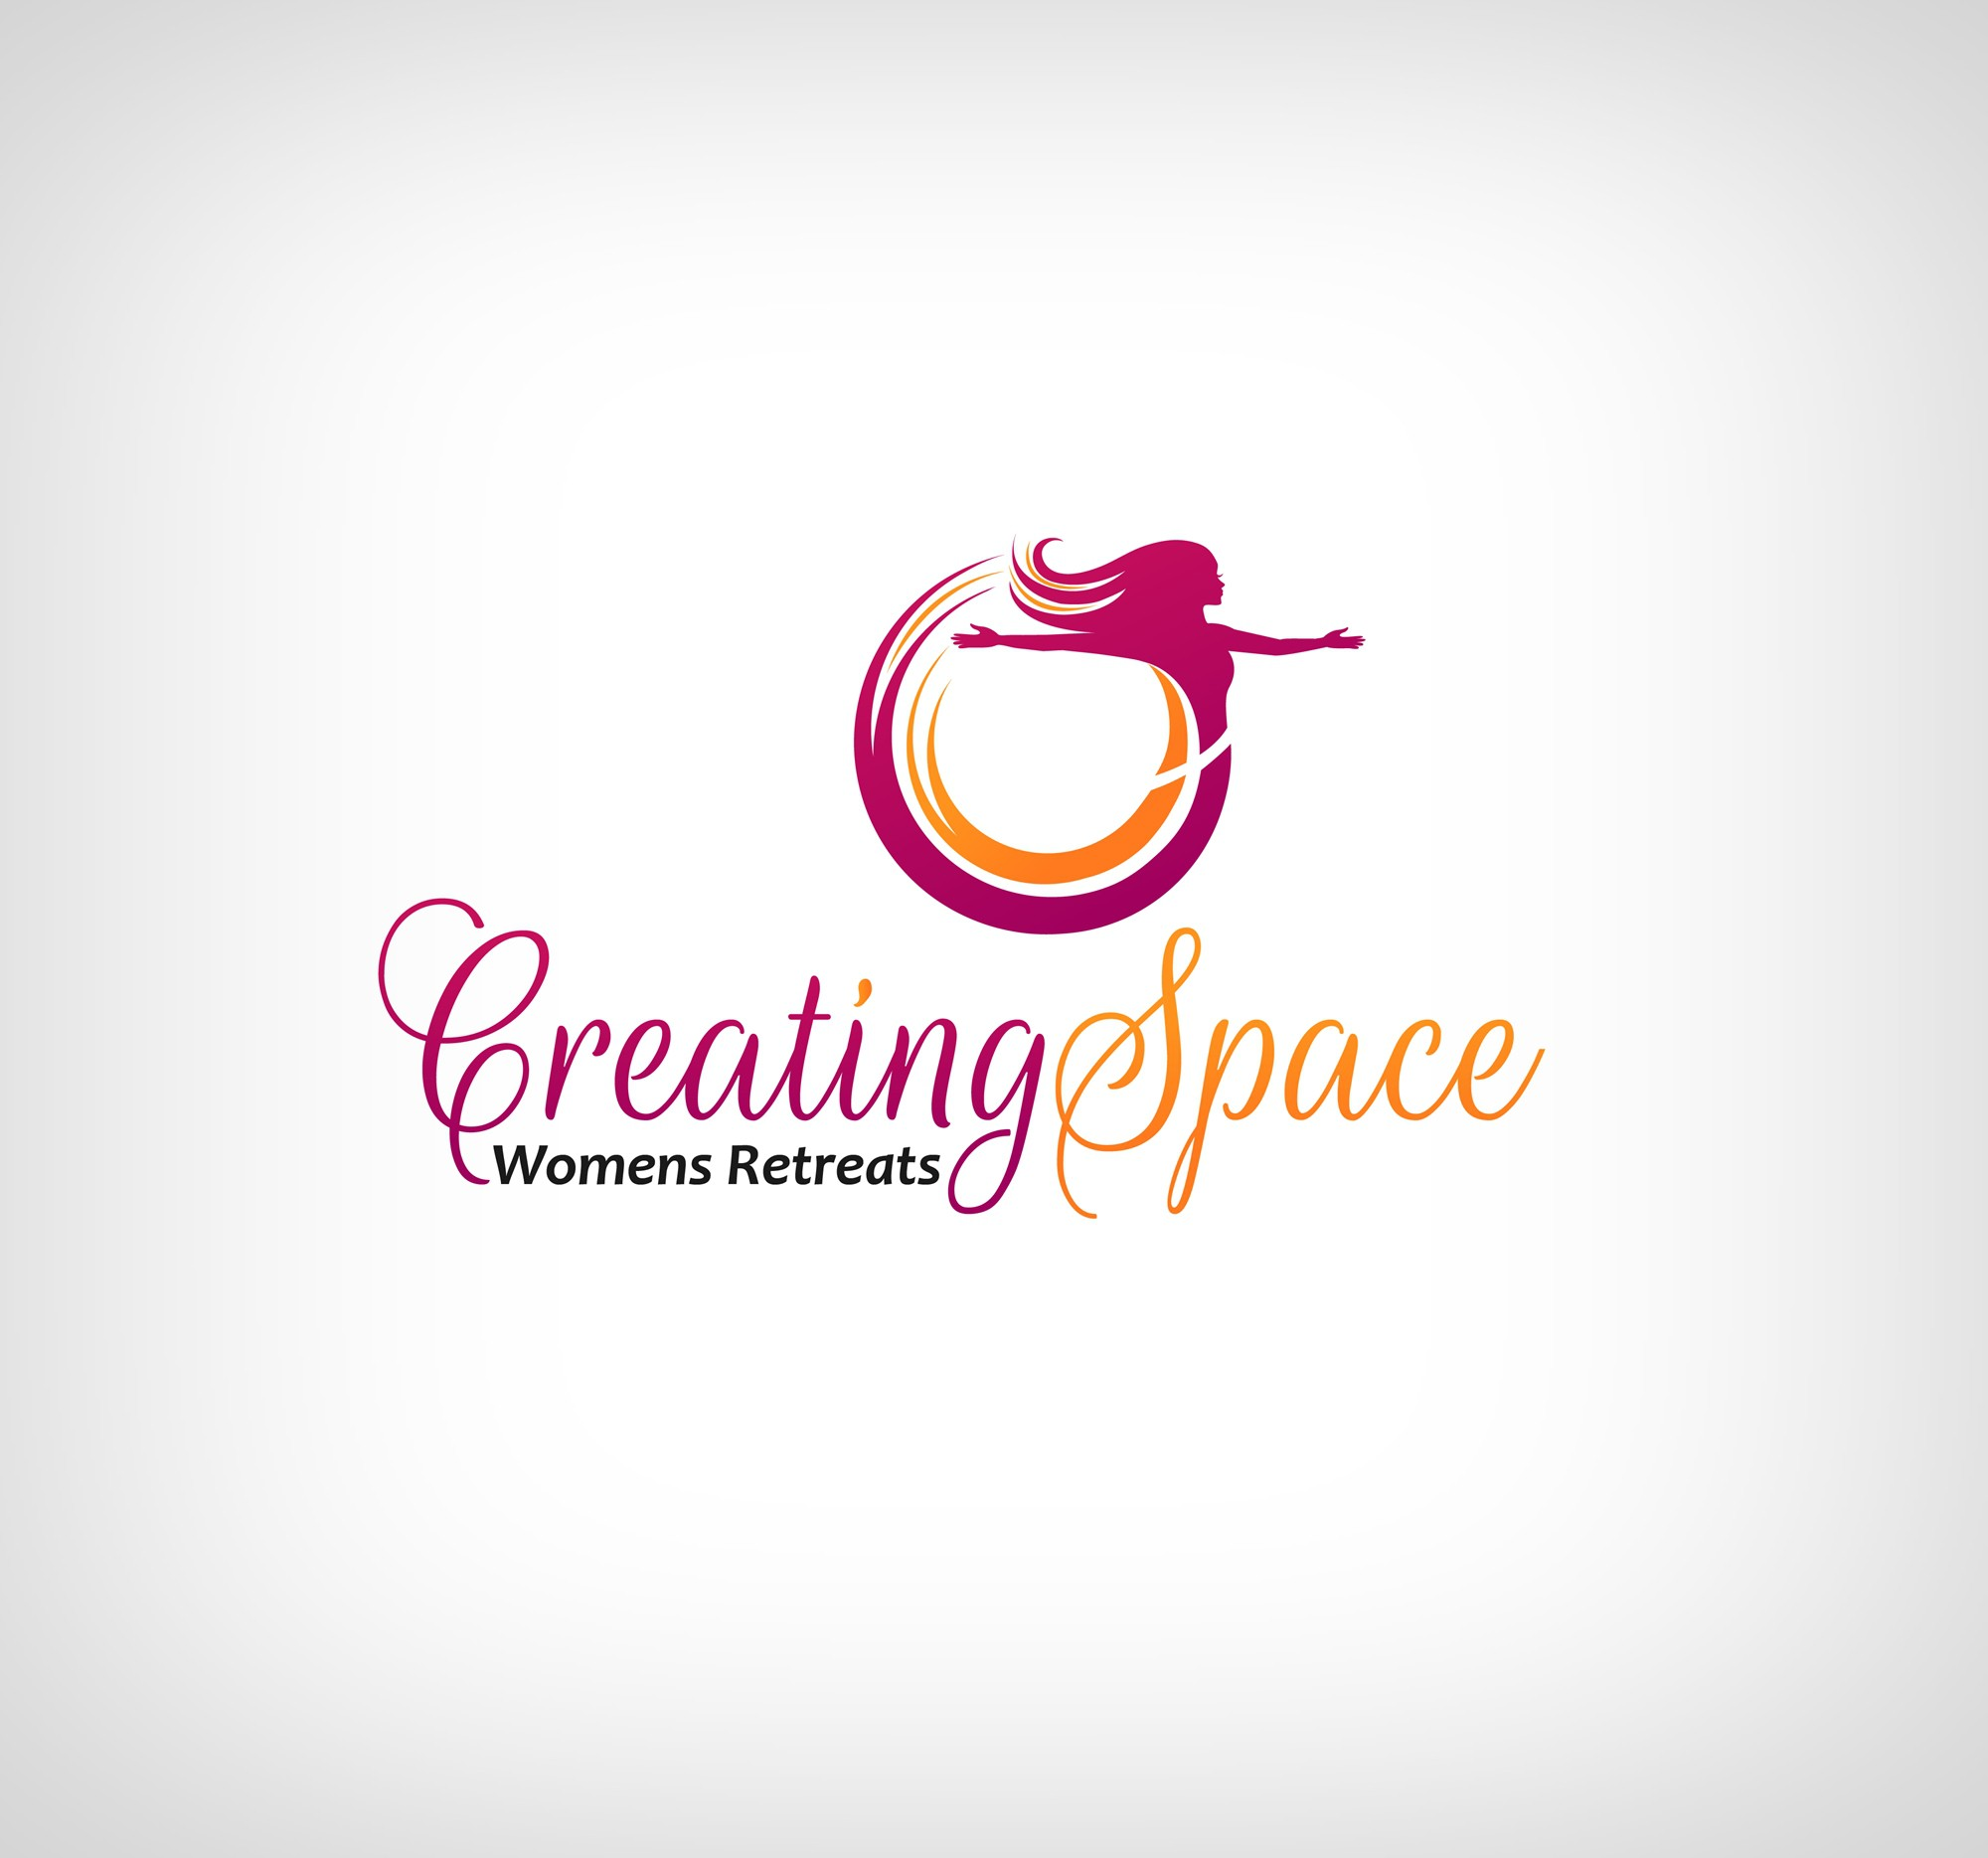 Creating Space Womens Retreats needs a new logo